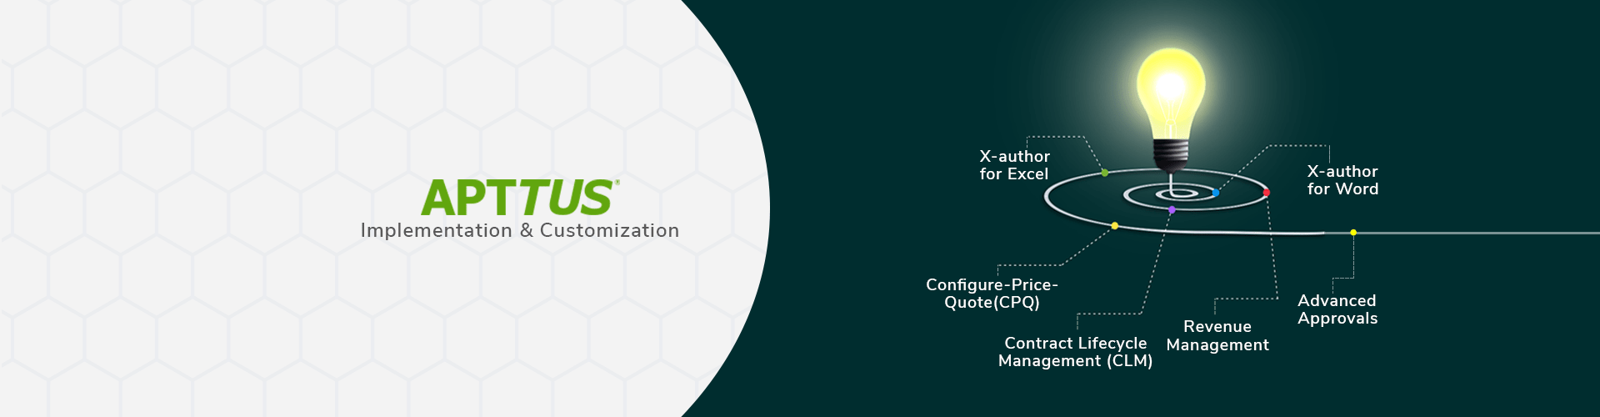 APTTUS Implementation & Customization